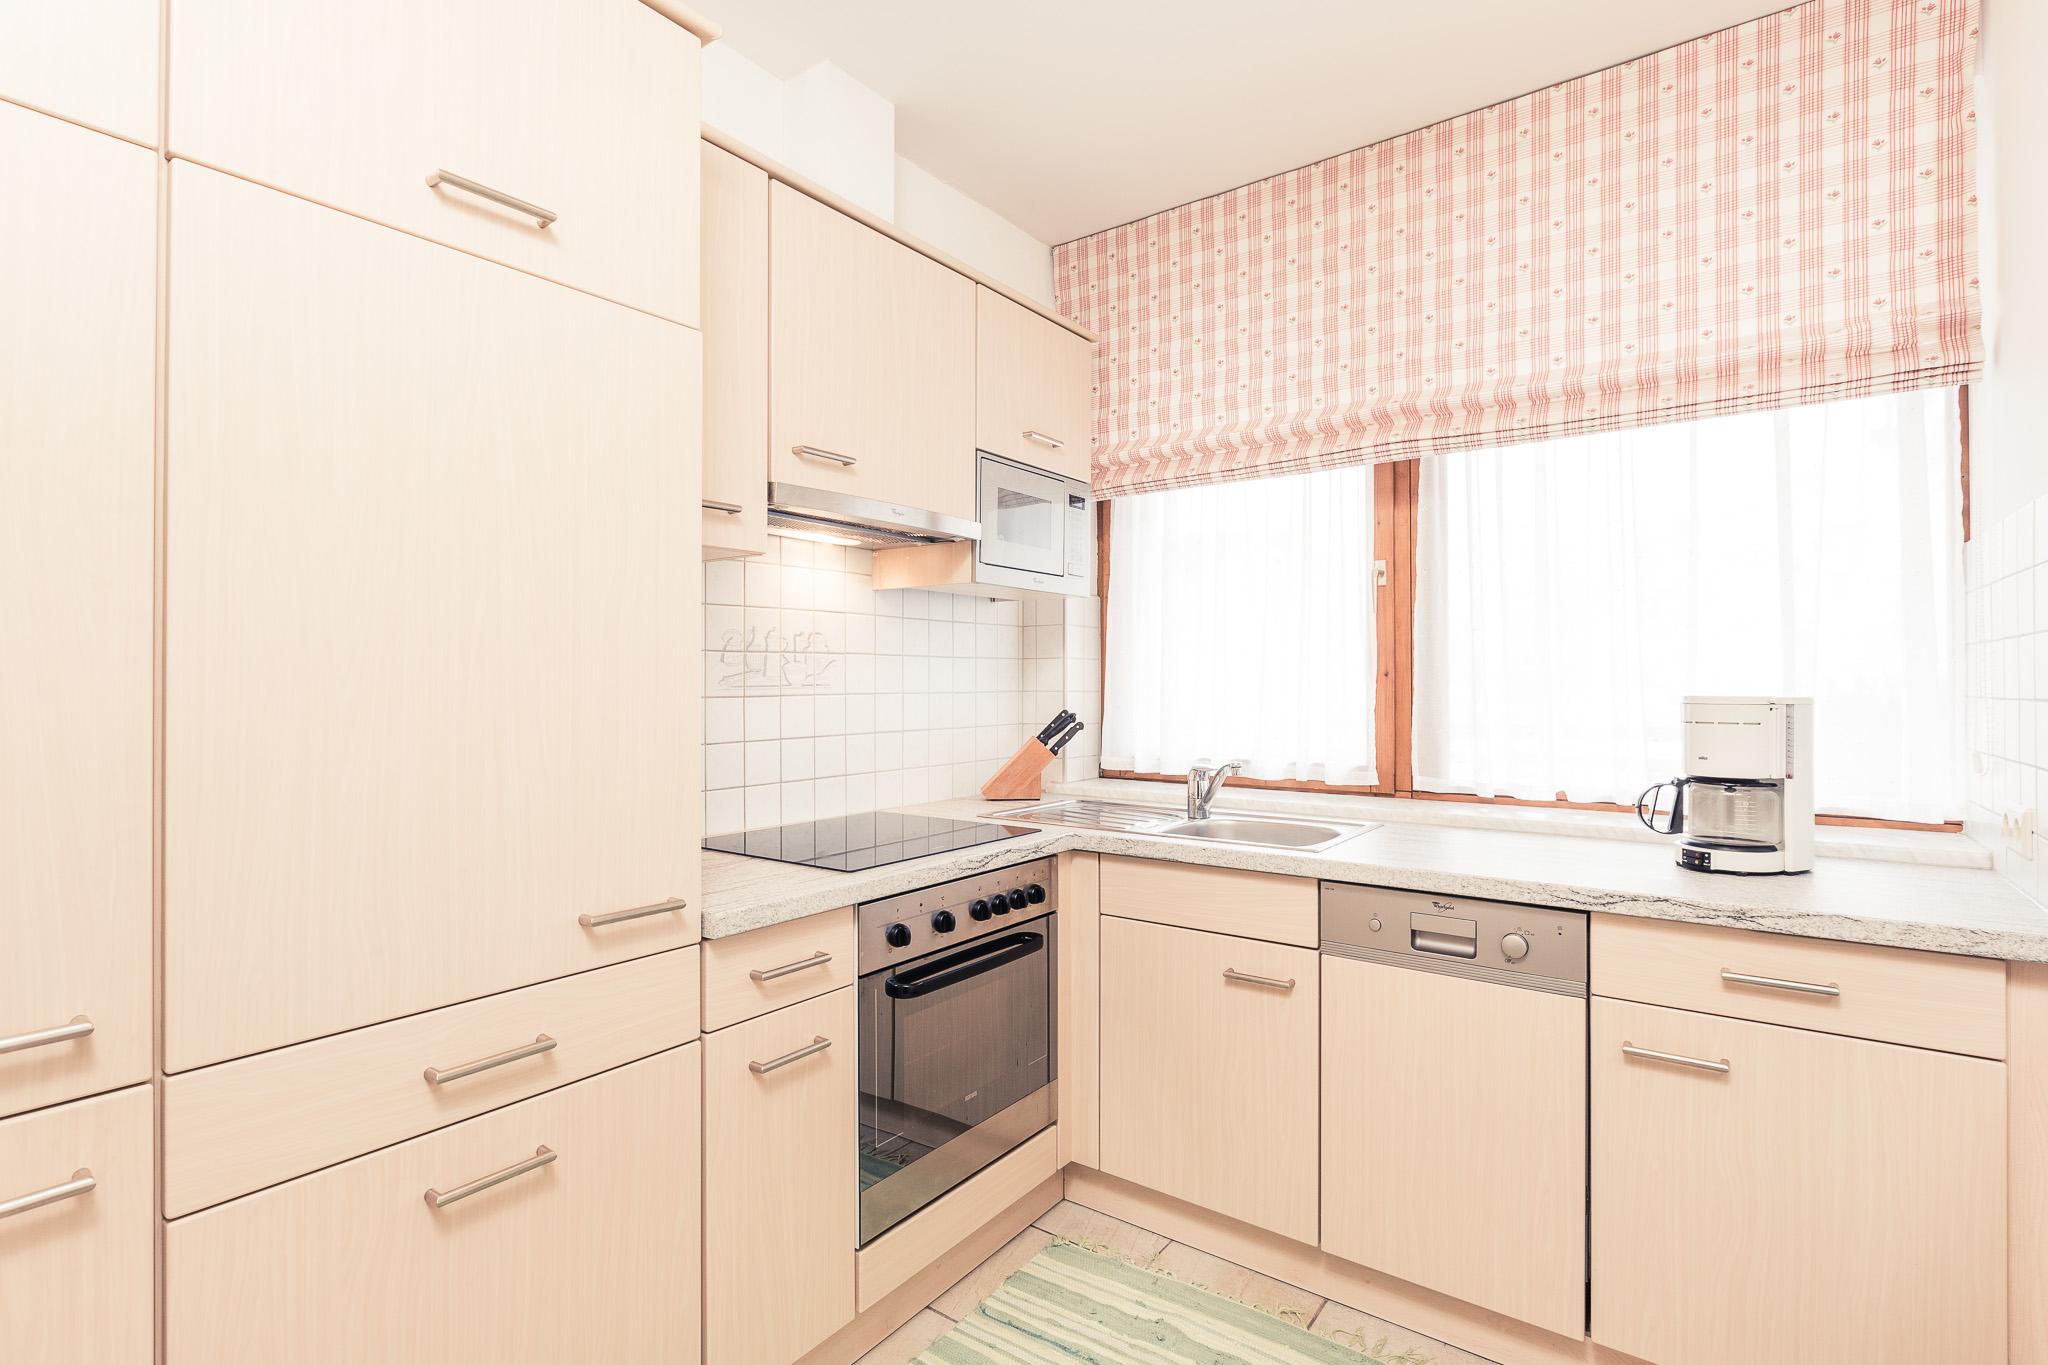 Timmelsjoch - Apartment 6-9 people in Sölden